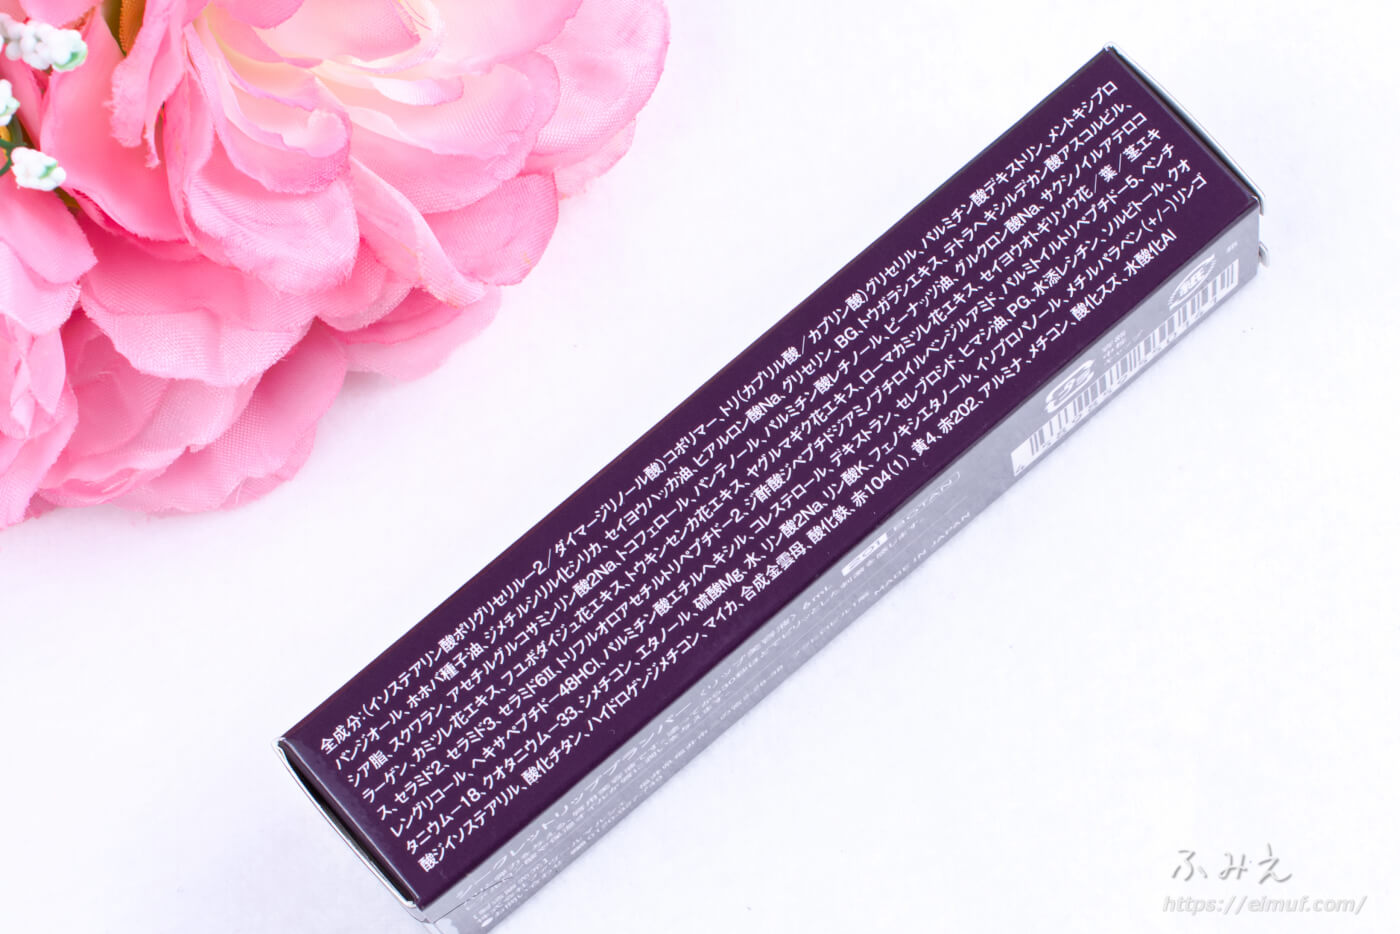 HIMITU シークレットリッププランパー #201(BOTAN) 外箱右側面